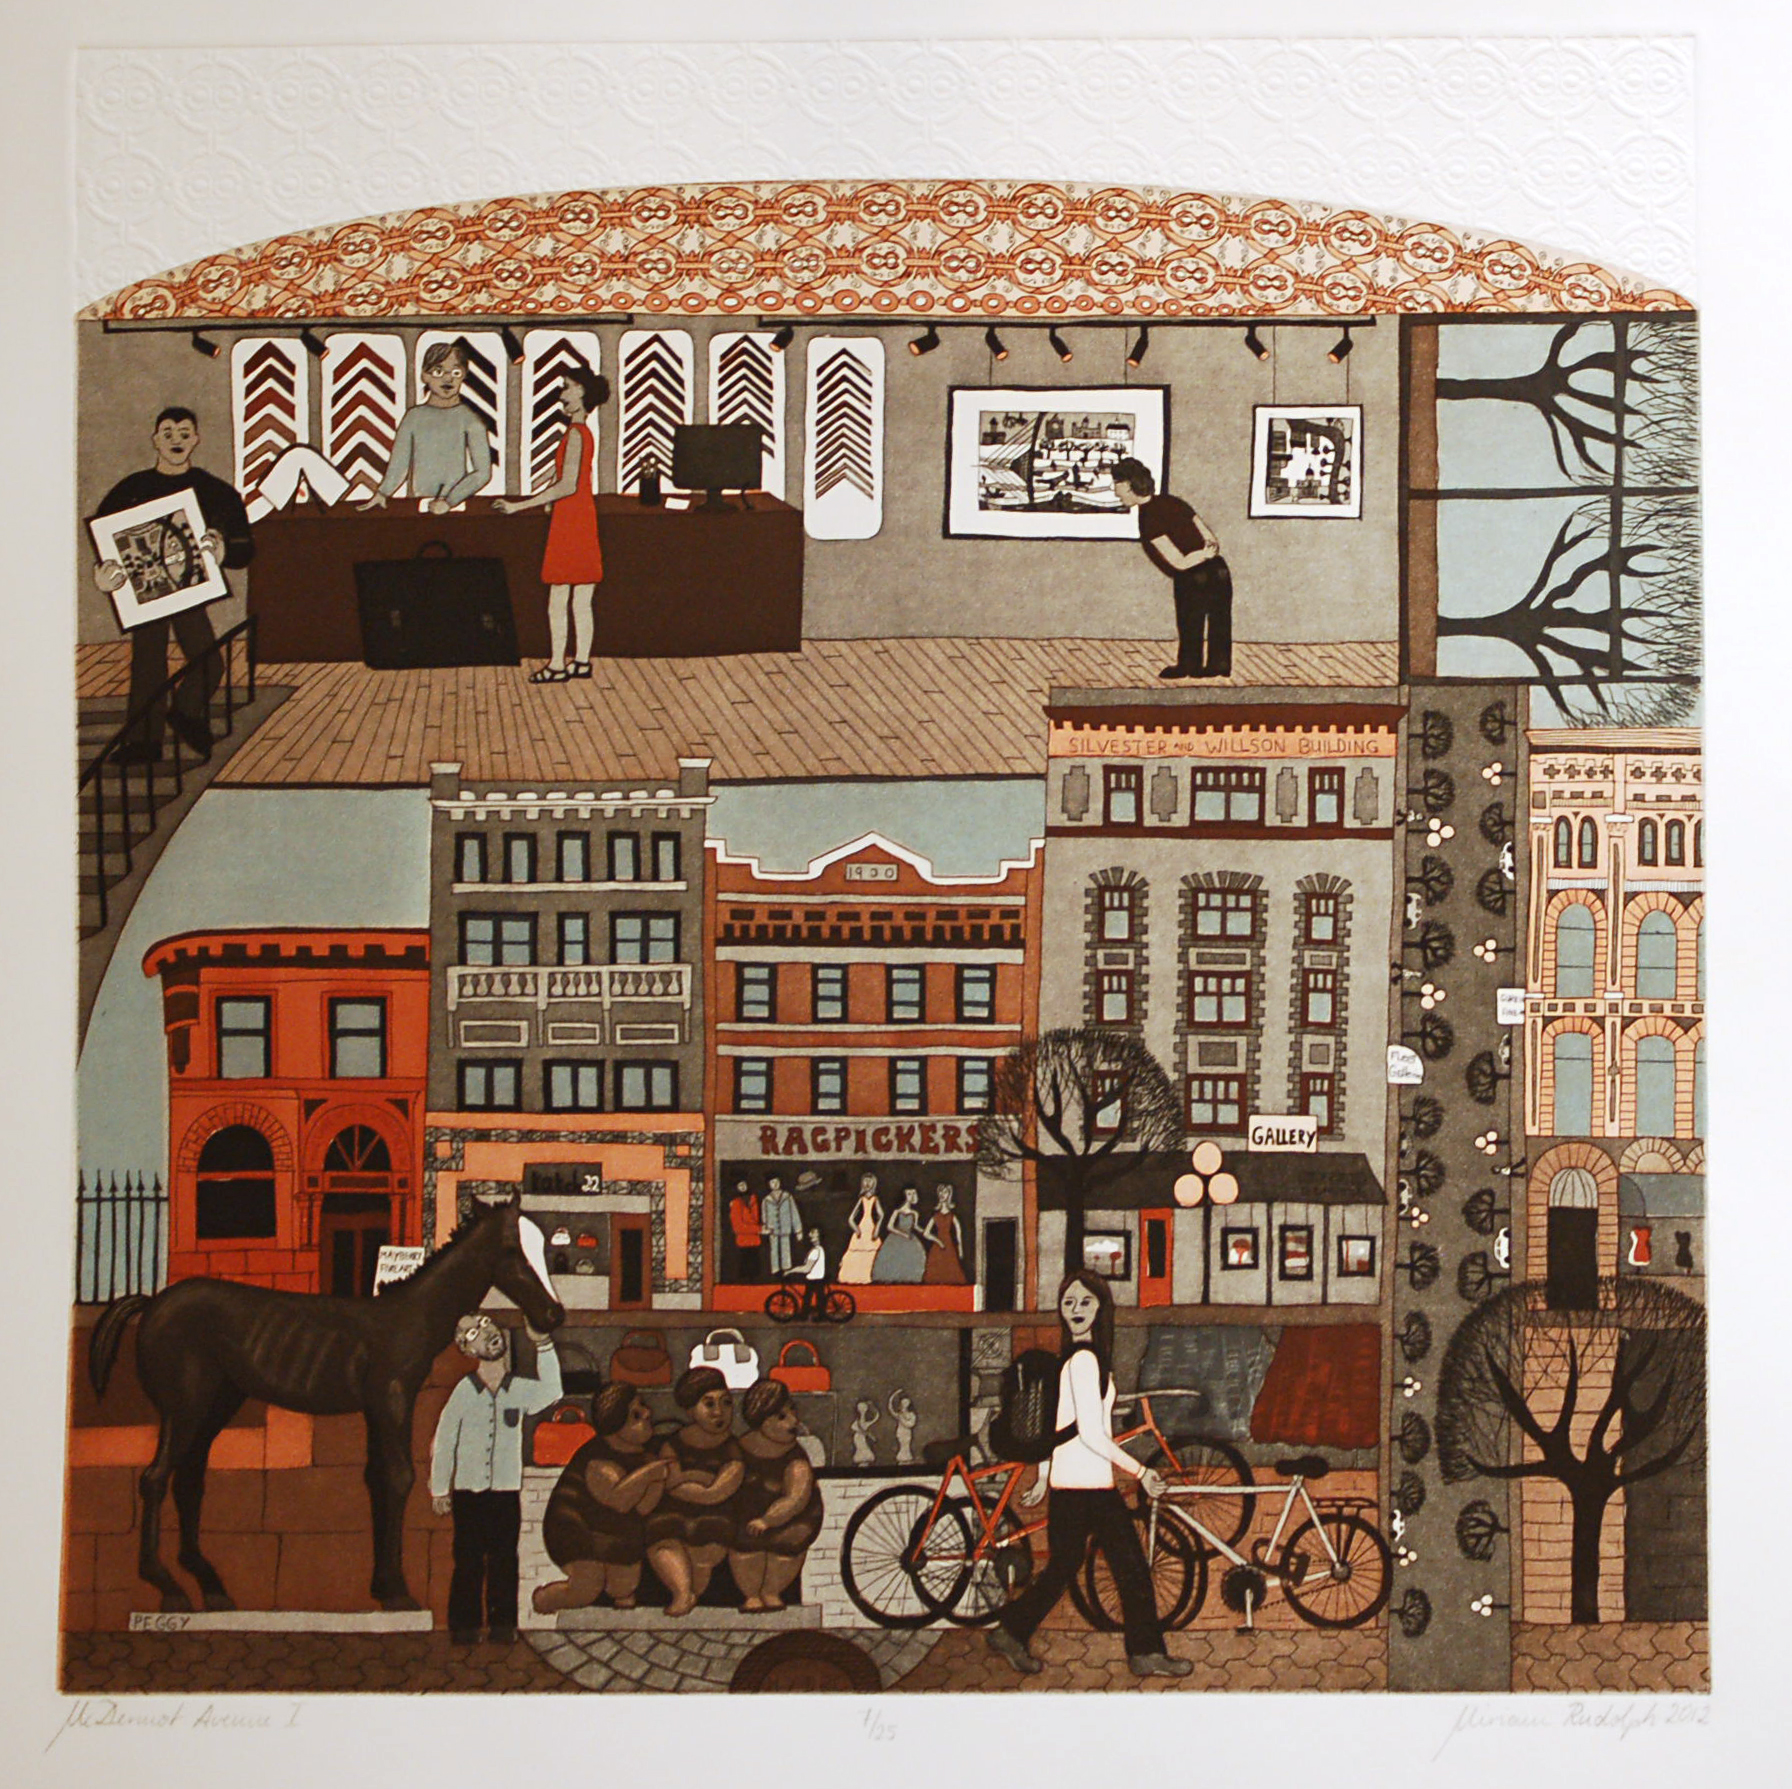 McDermot Avenue I, Double-Plate Colour Etching, Relief Roll through Stencil, 45.5cm x 45.5cm, 2012